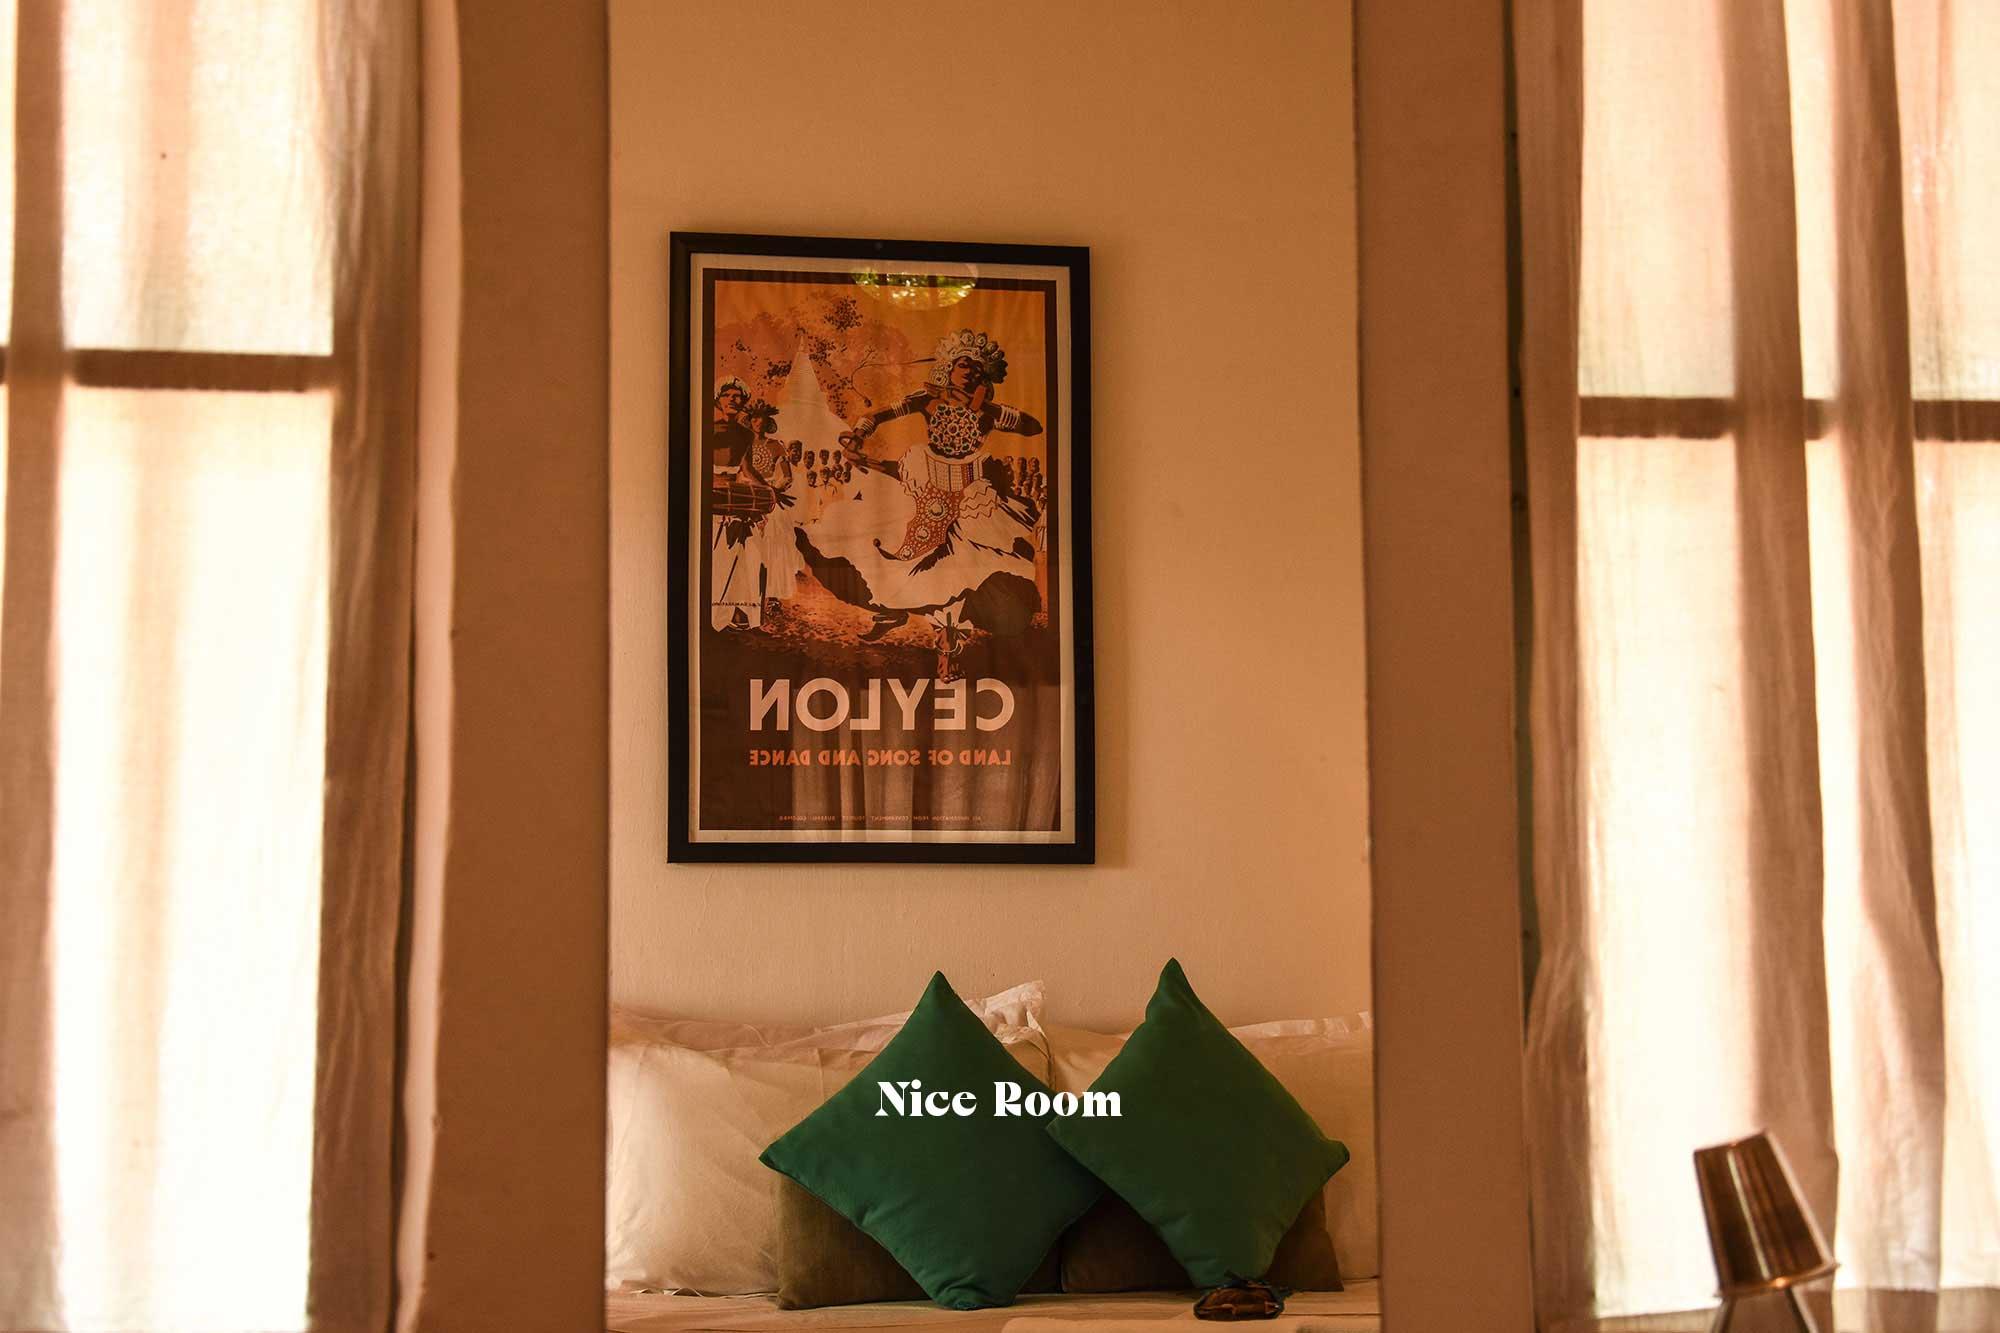 https://www.soulandsurf.com/wp-content/uploads/2021/10/roomsindia-images-@peterchamberlainphoto-_-@tarashirls_Rooms_7.jpg